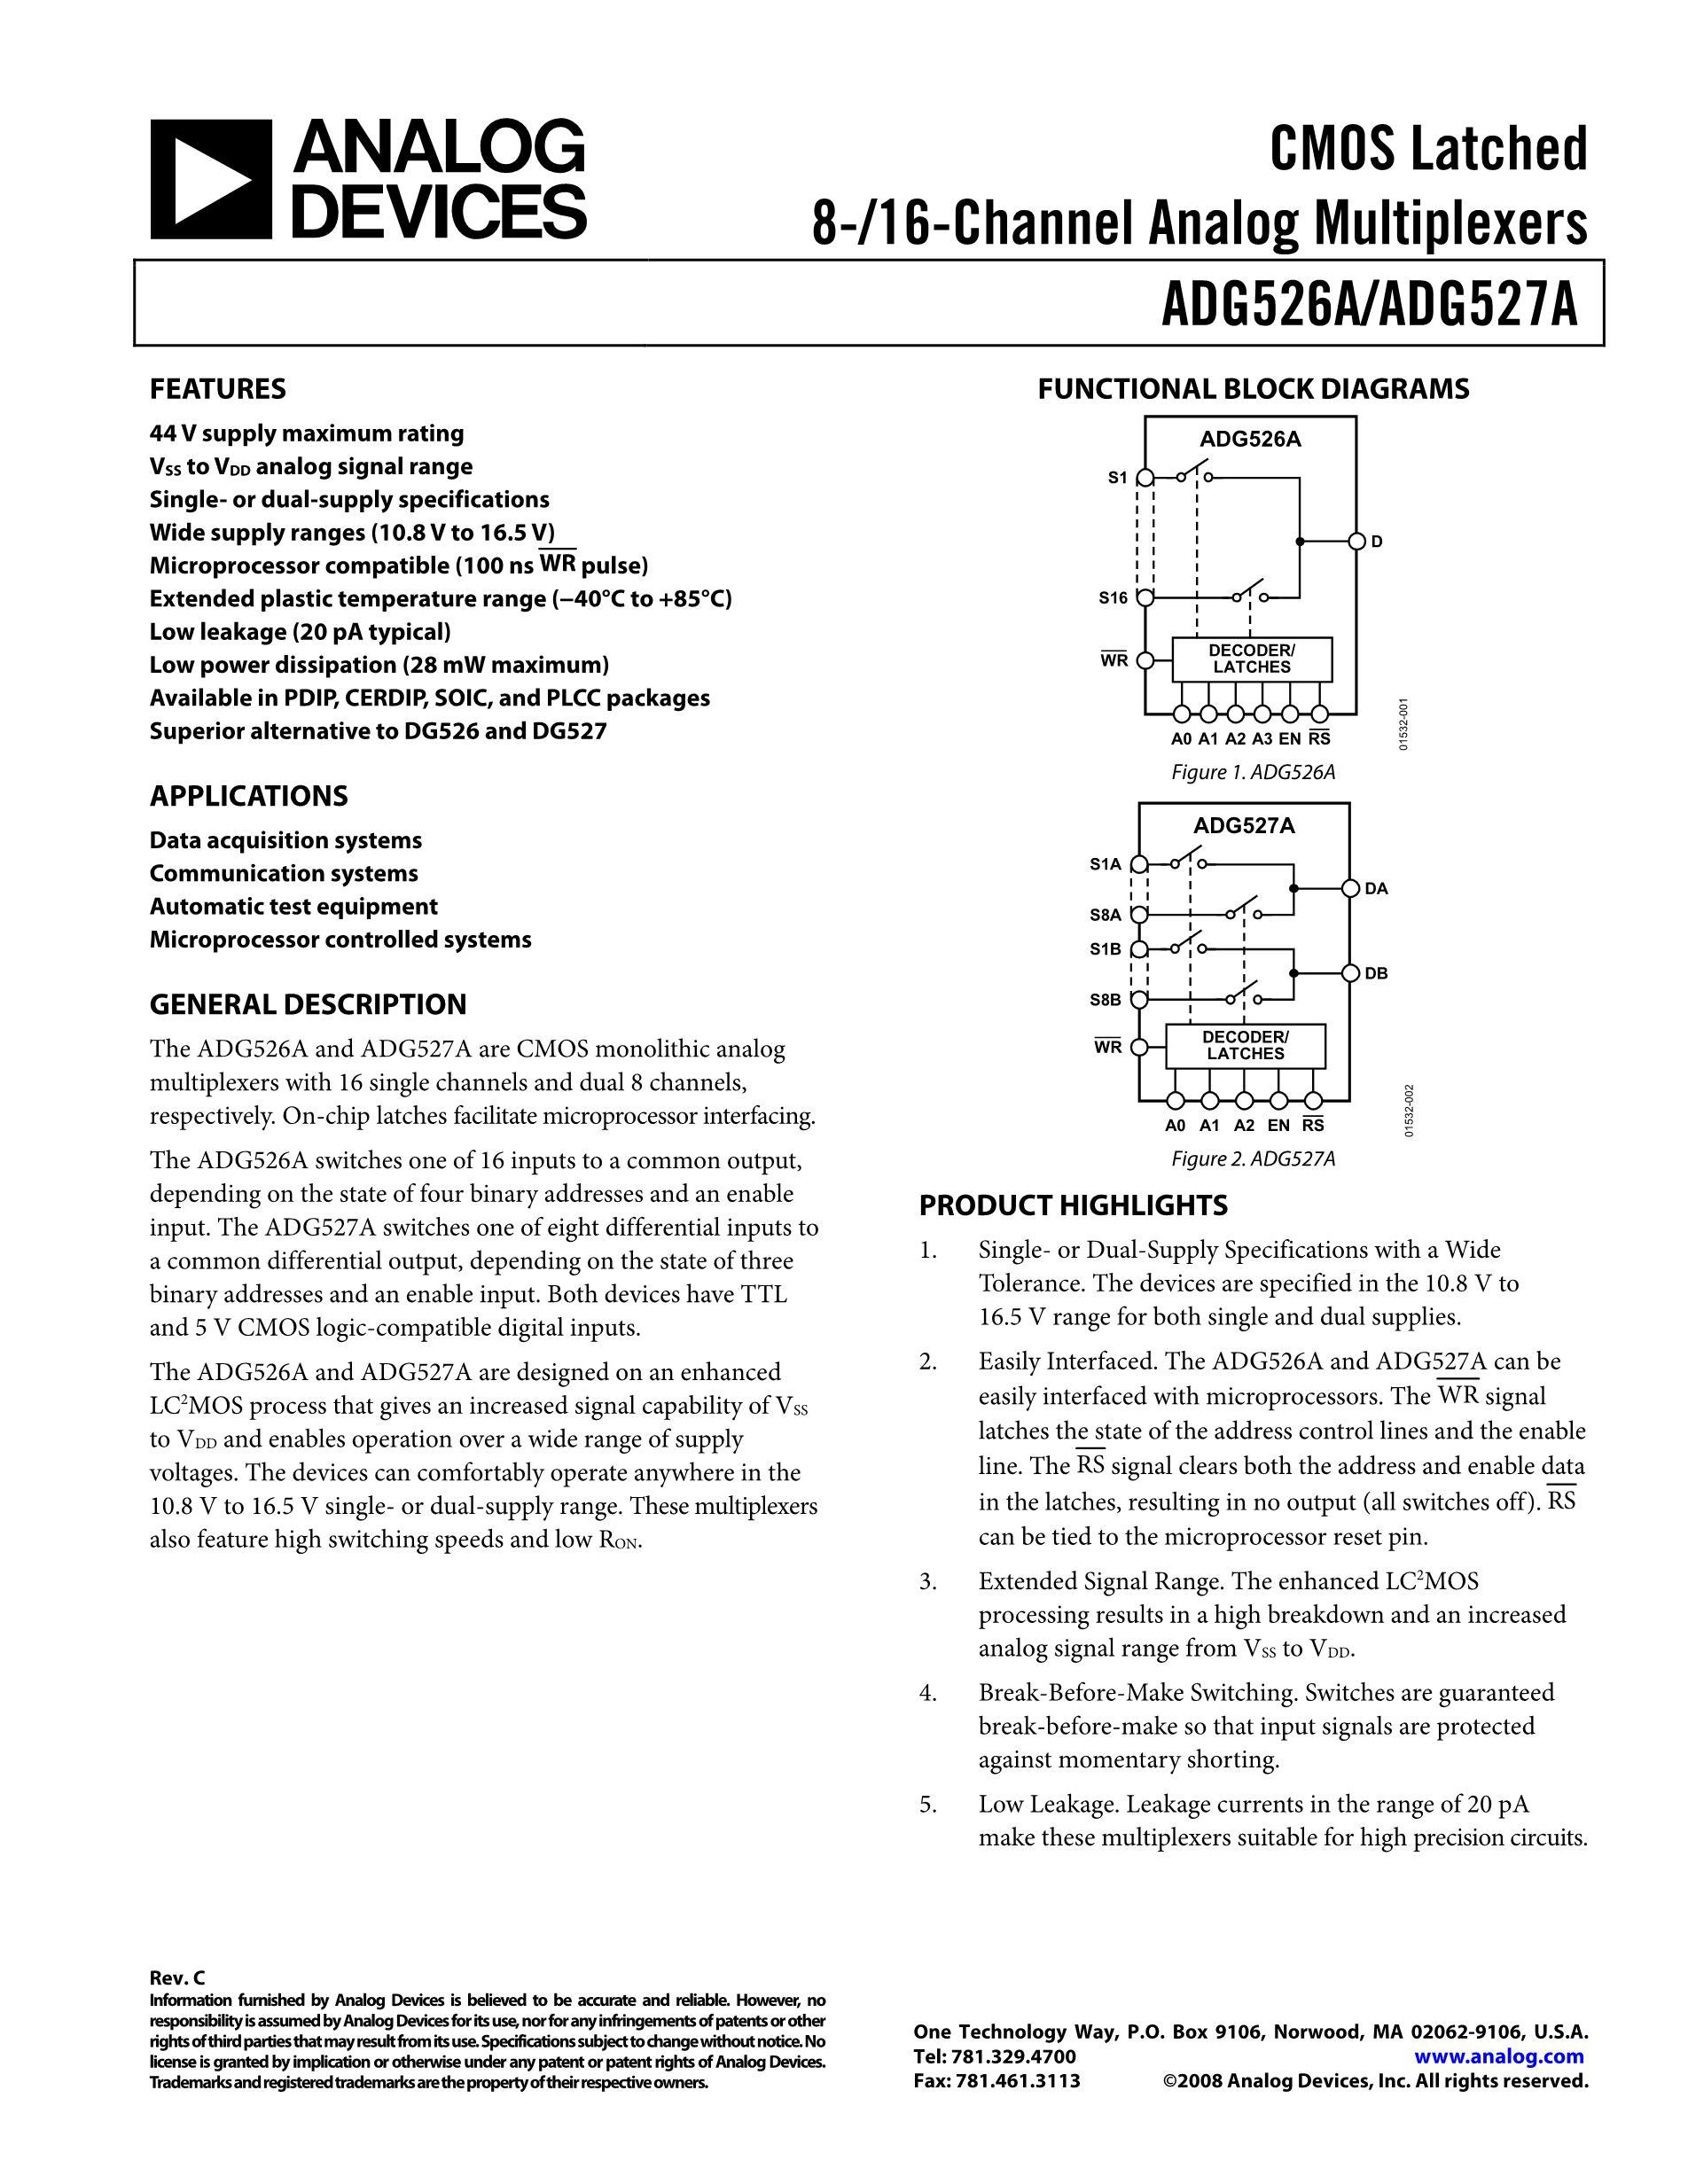 ADG509FBRNZ's pdf picture 1